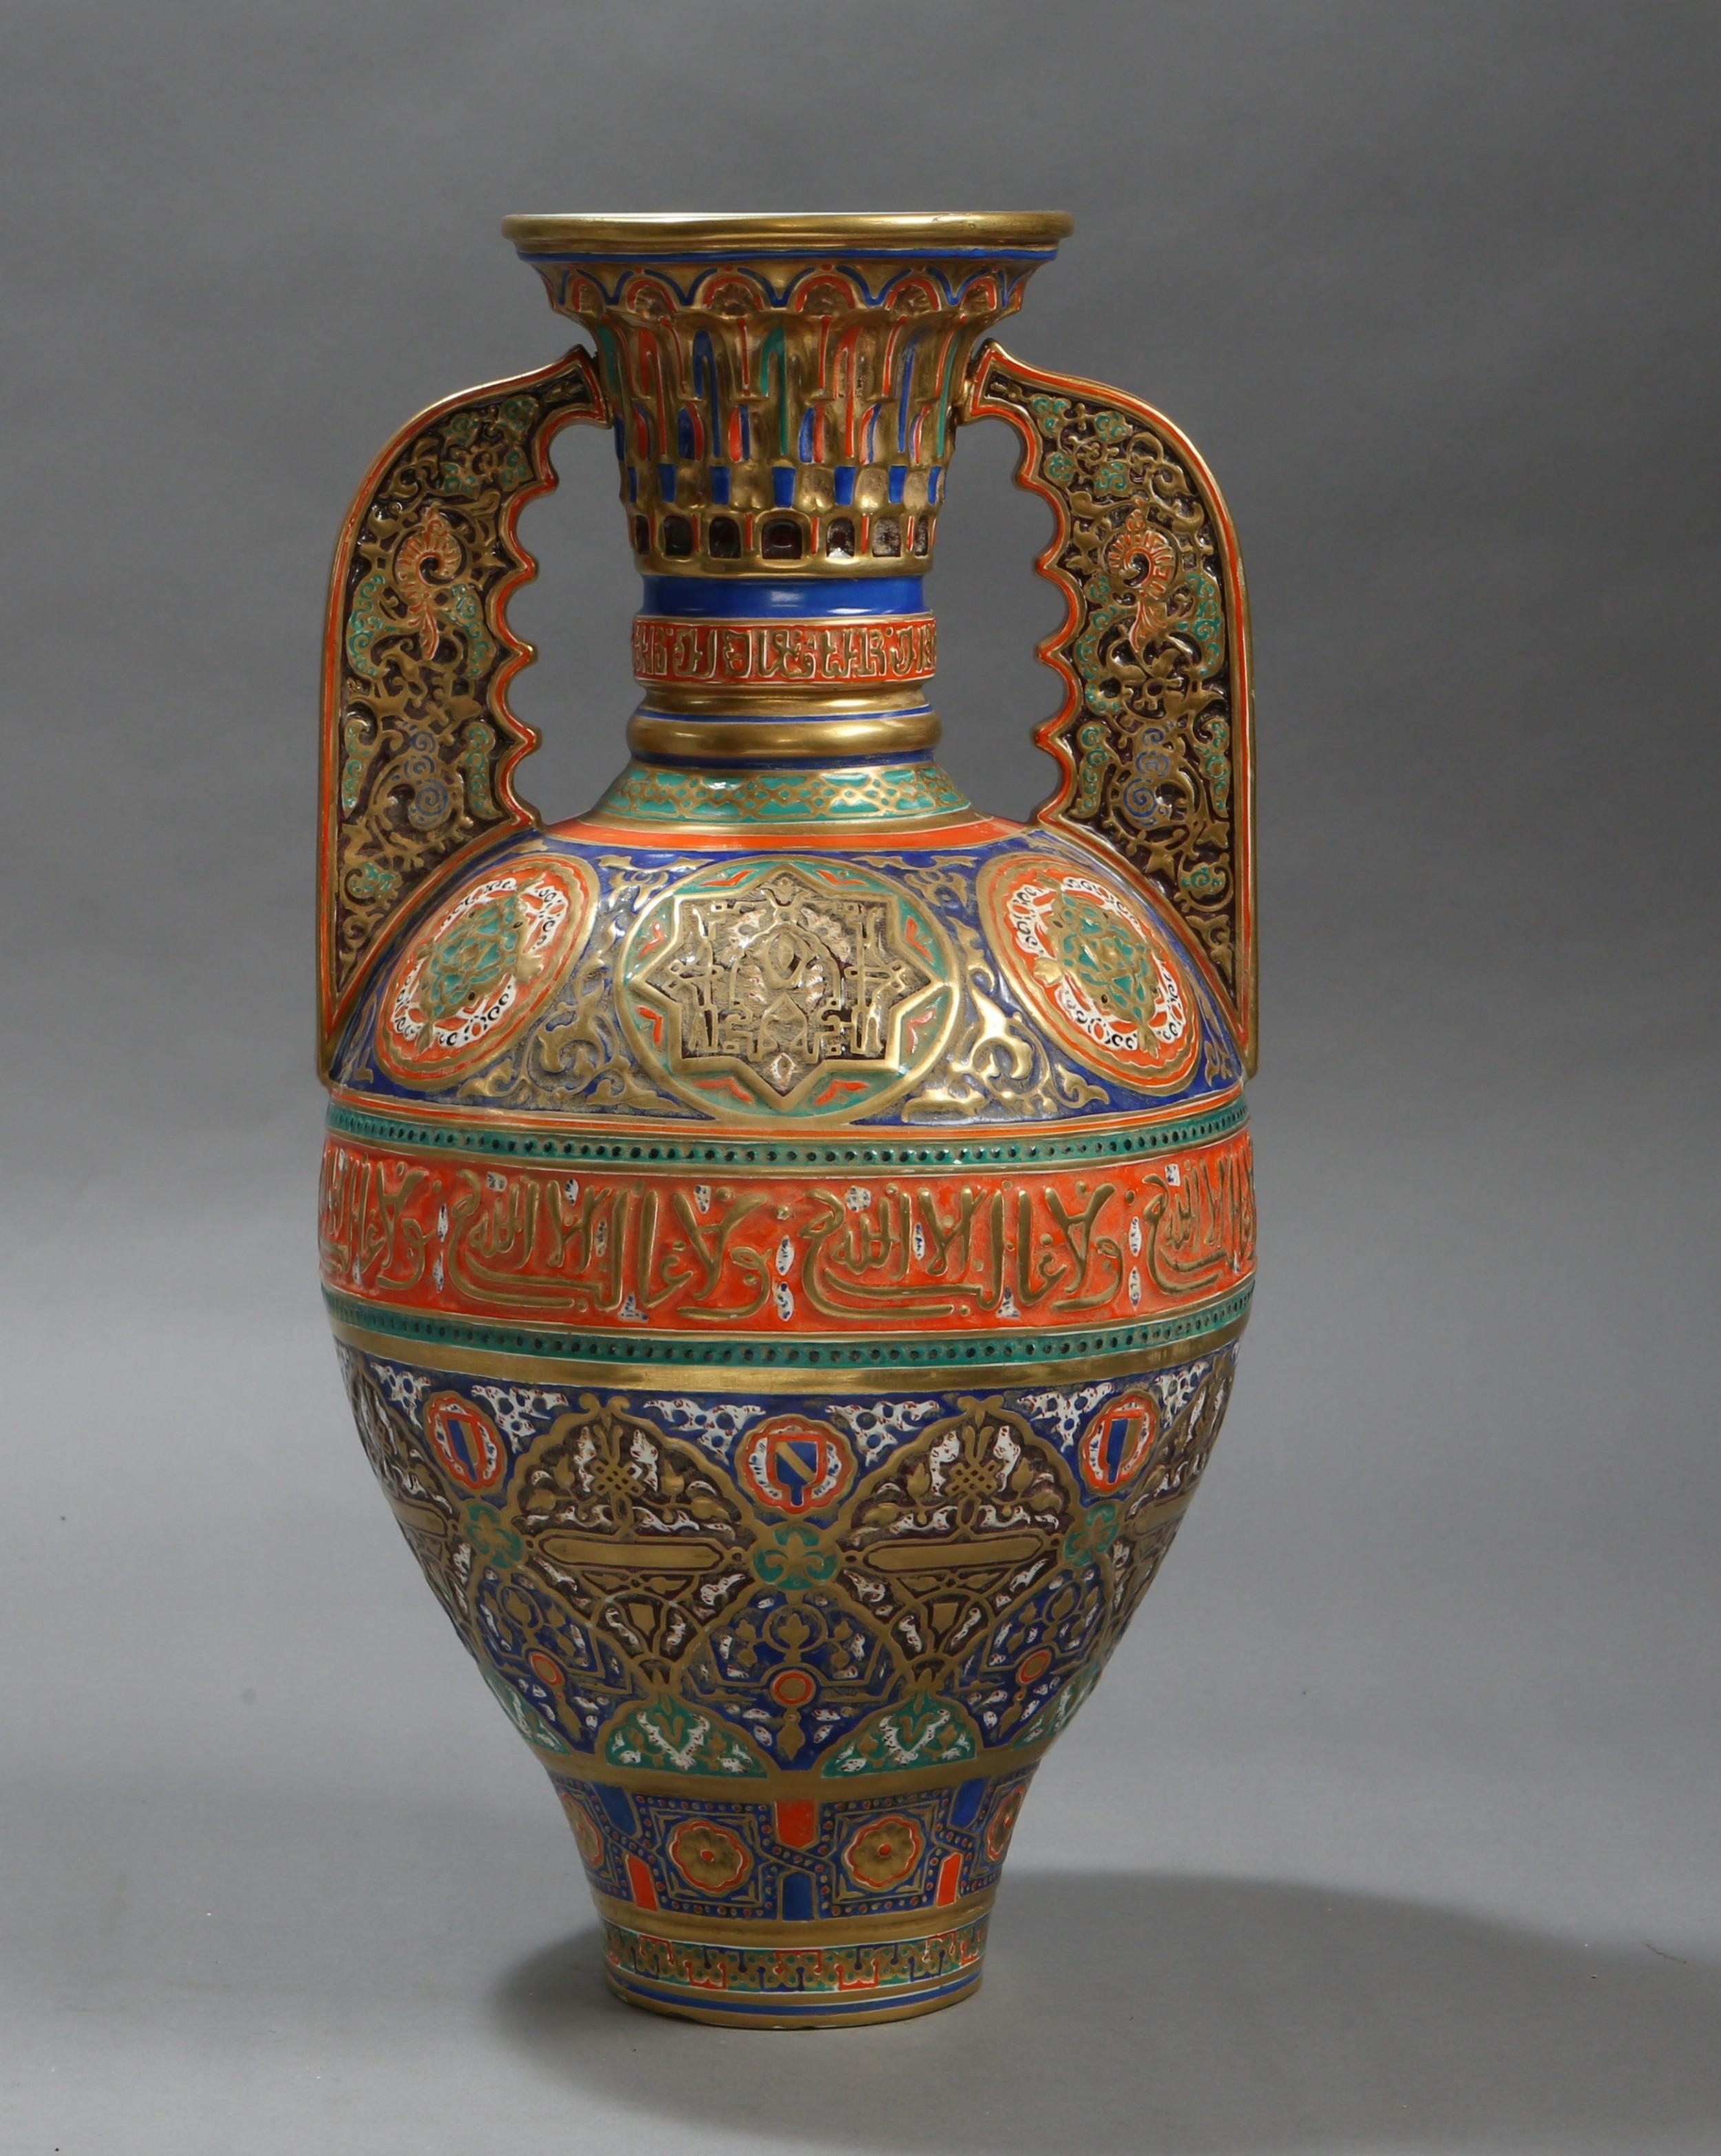 19th century alhambrastyle vase